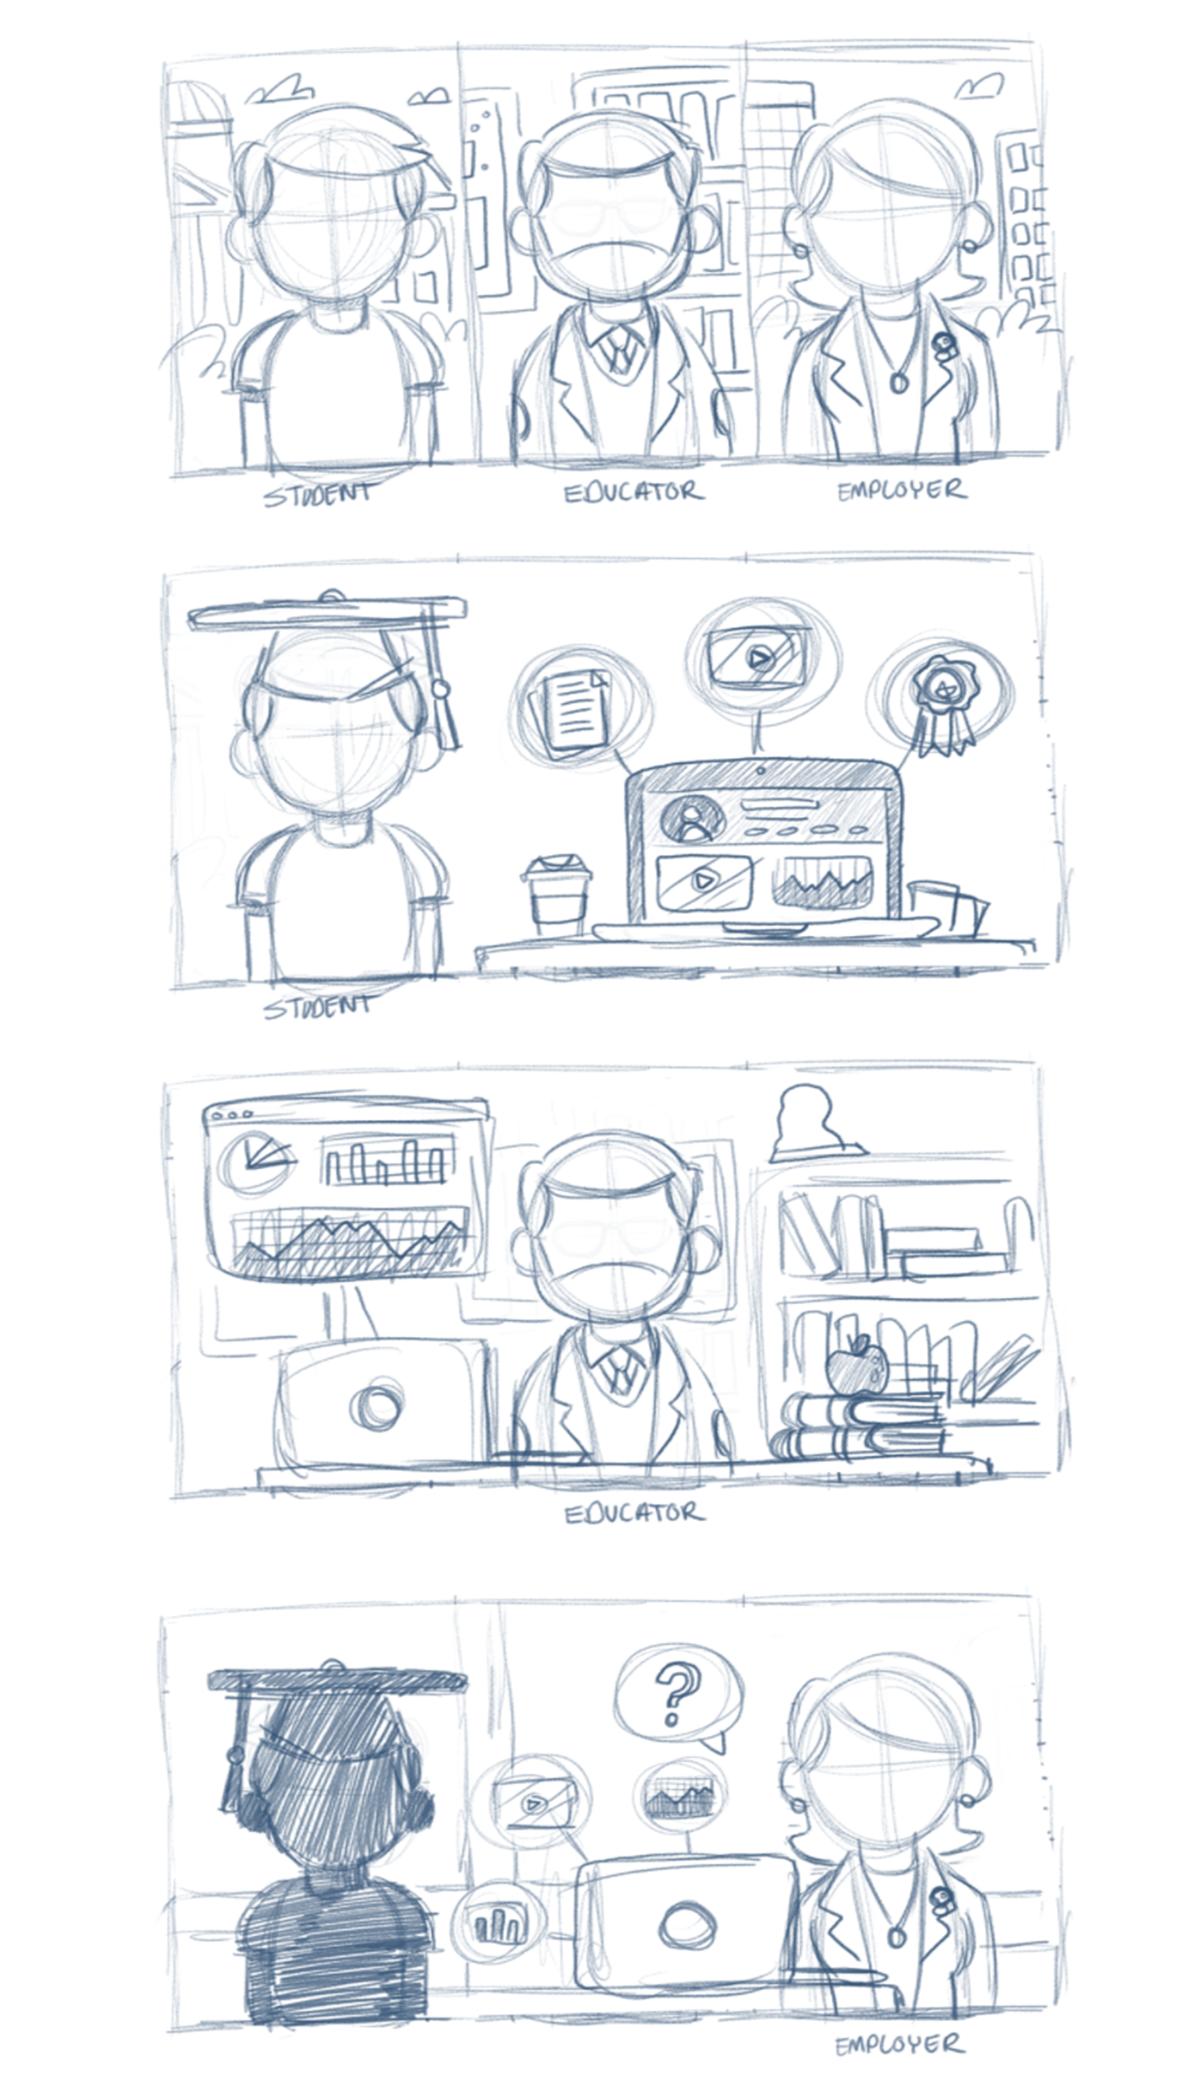 Portfolium_Homepage_Sketch.png